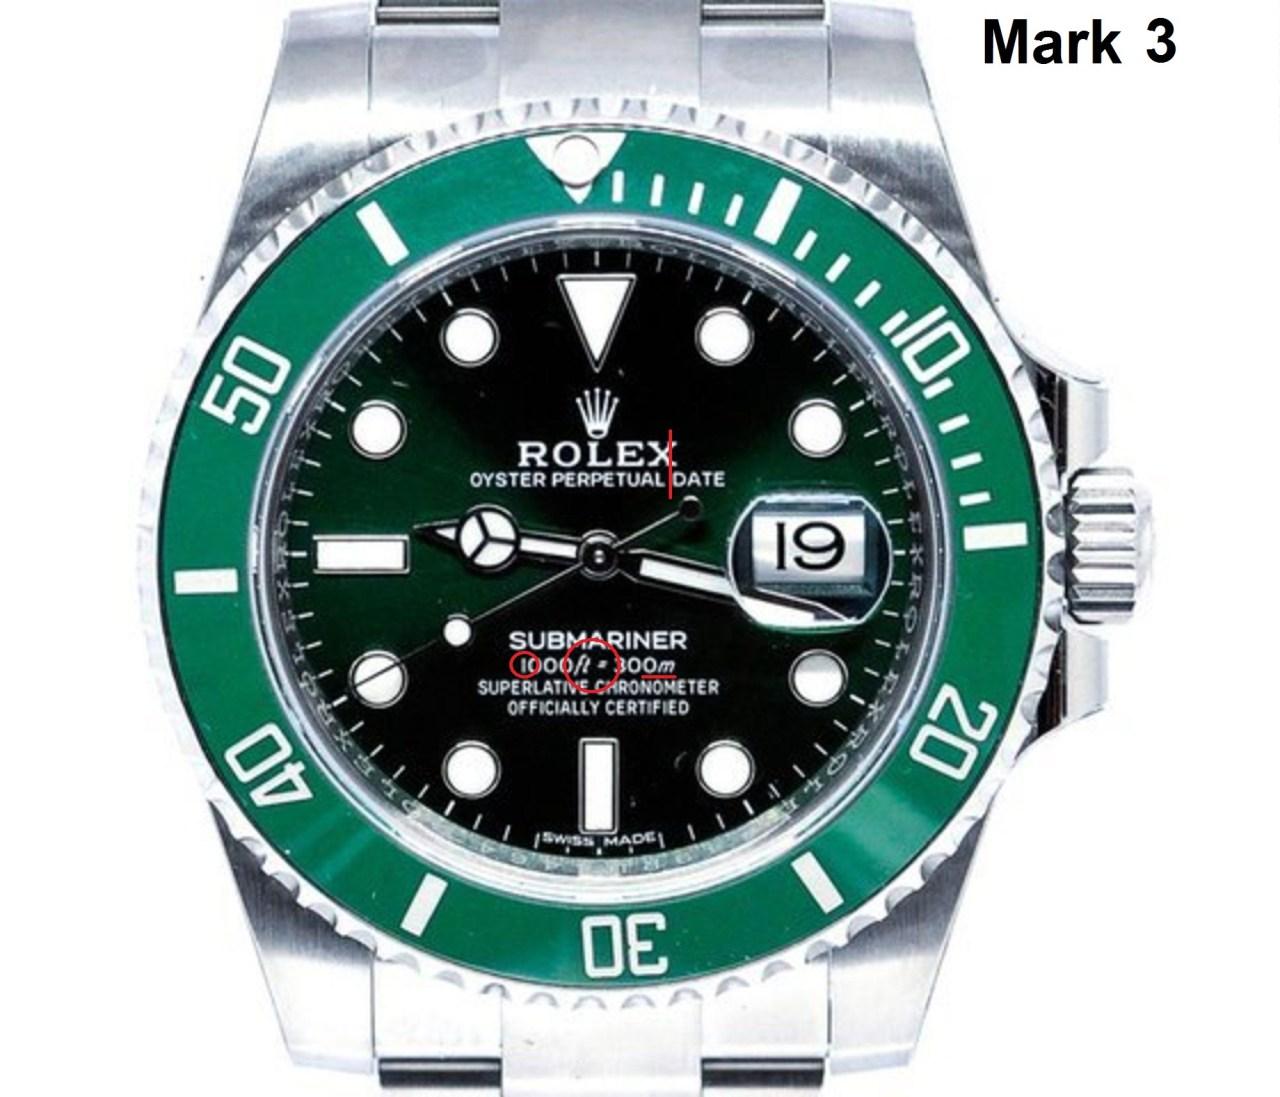 116610LV Mk3